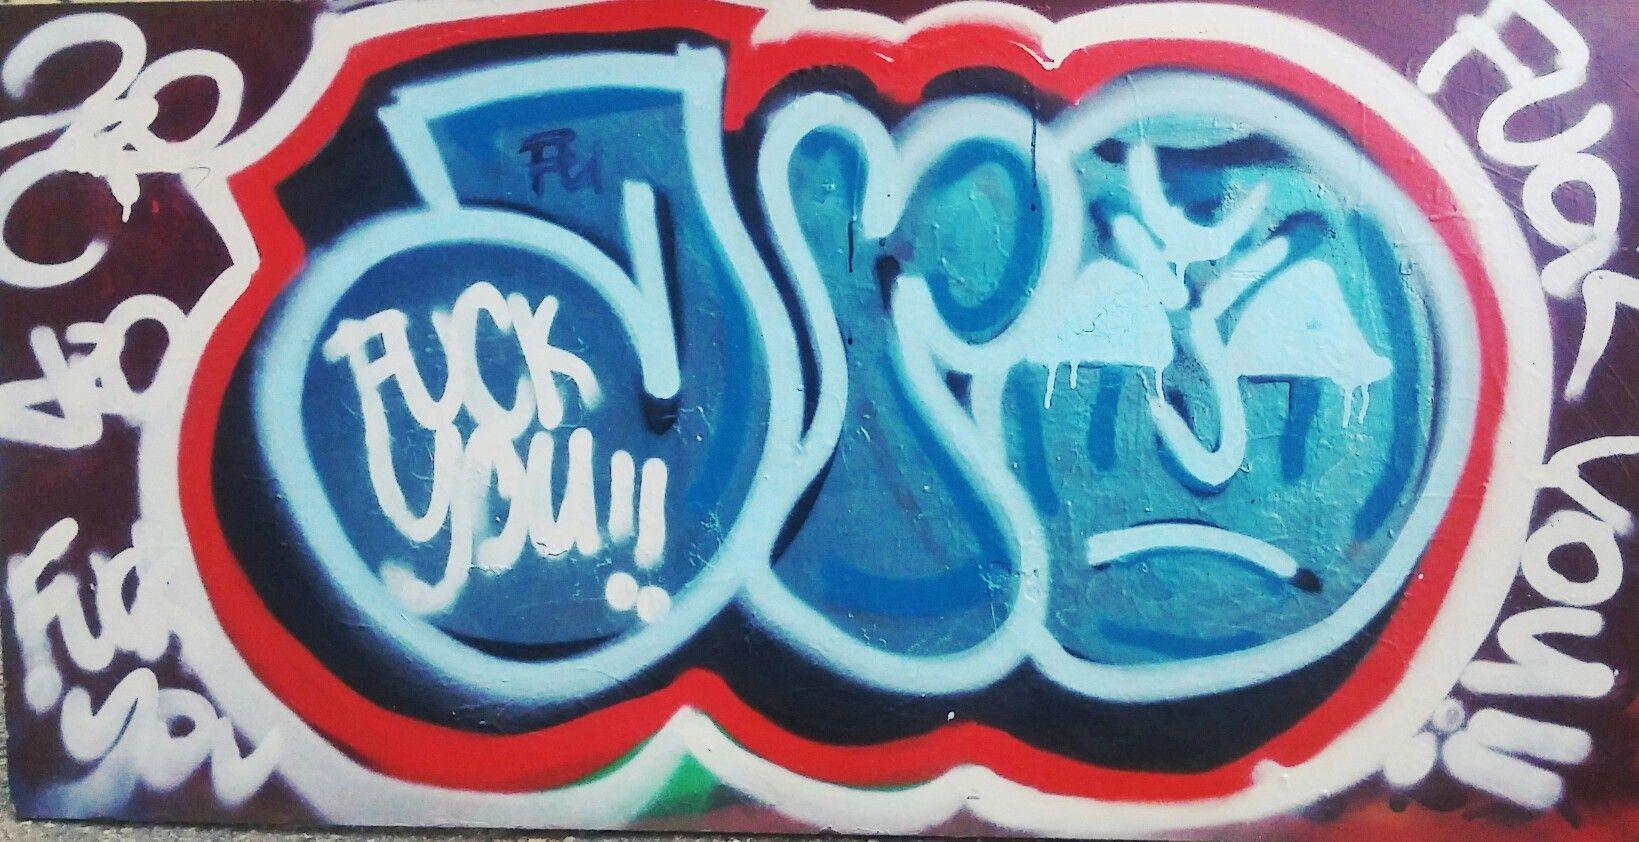 pin by shoeless on graffiti art and lettering graffiti on wall street bets logo id=92917